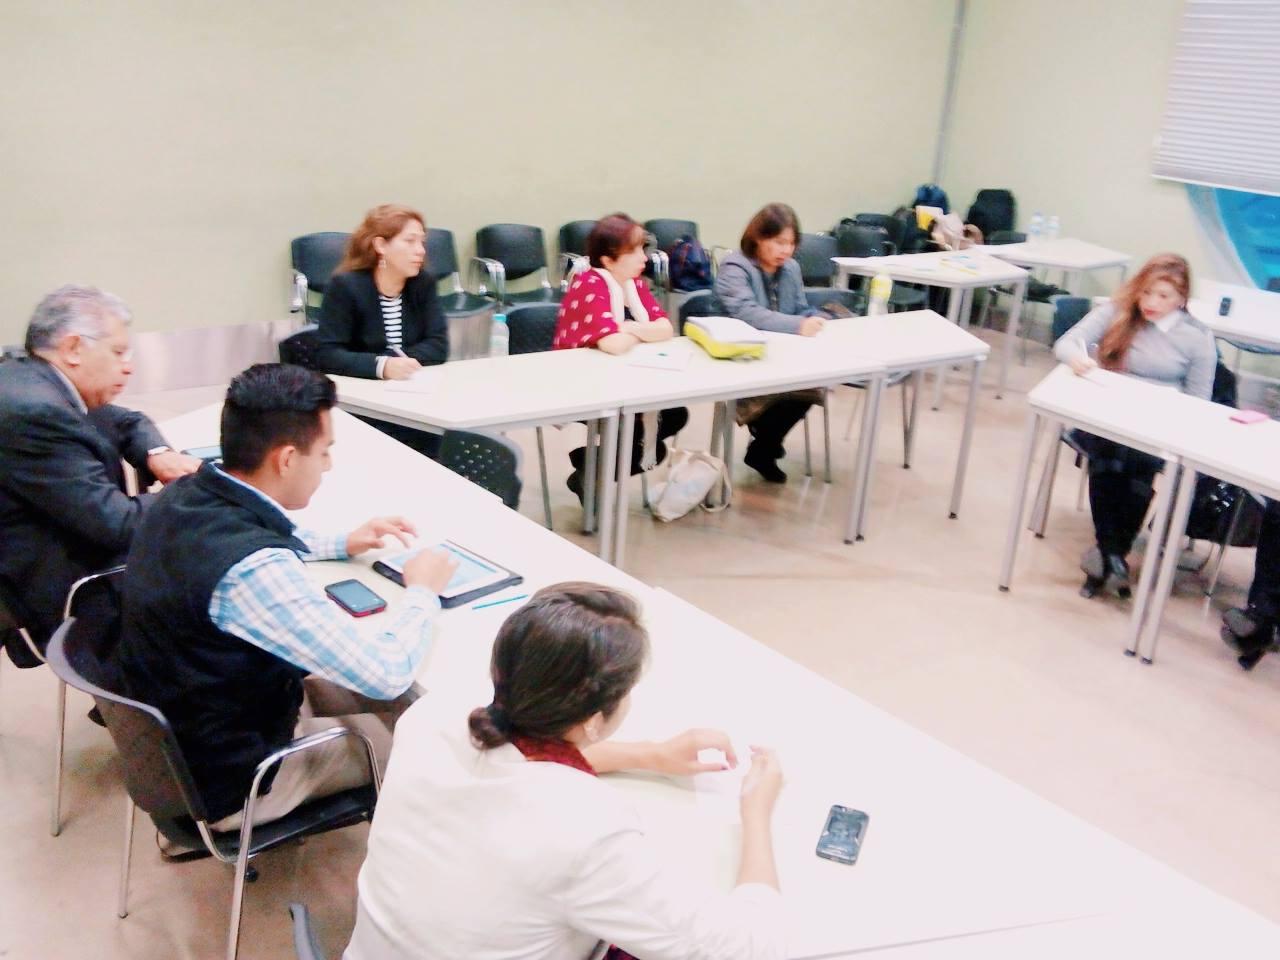 Reunión_internacional_de_la_Asociación_Internacional_de_Educadores_para_la_Paz,_Querétaro_2